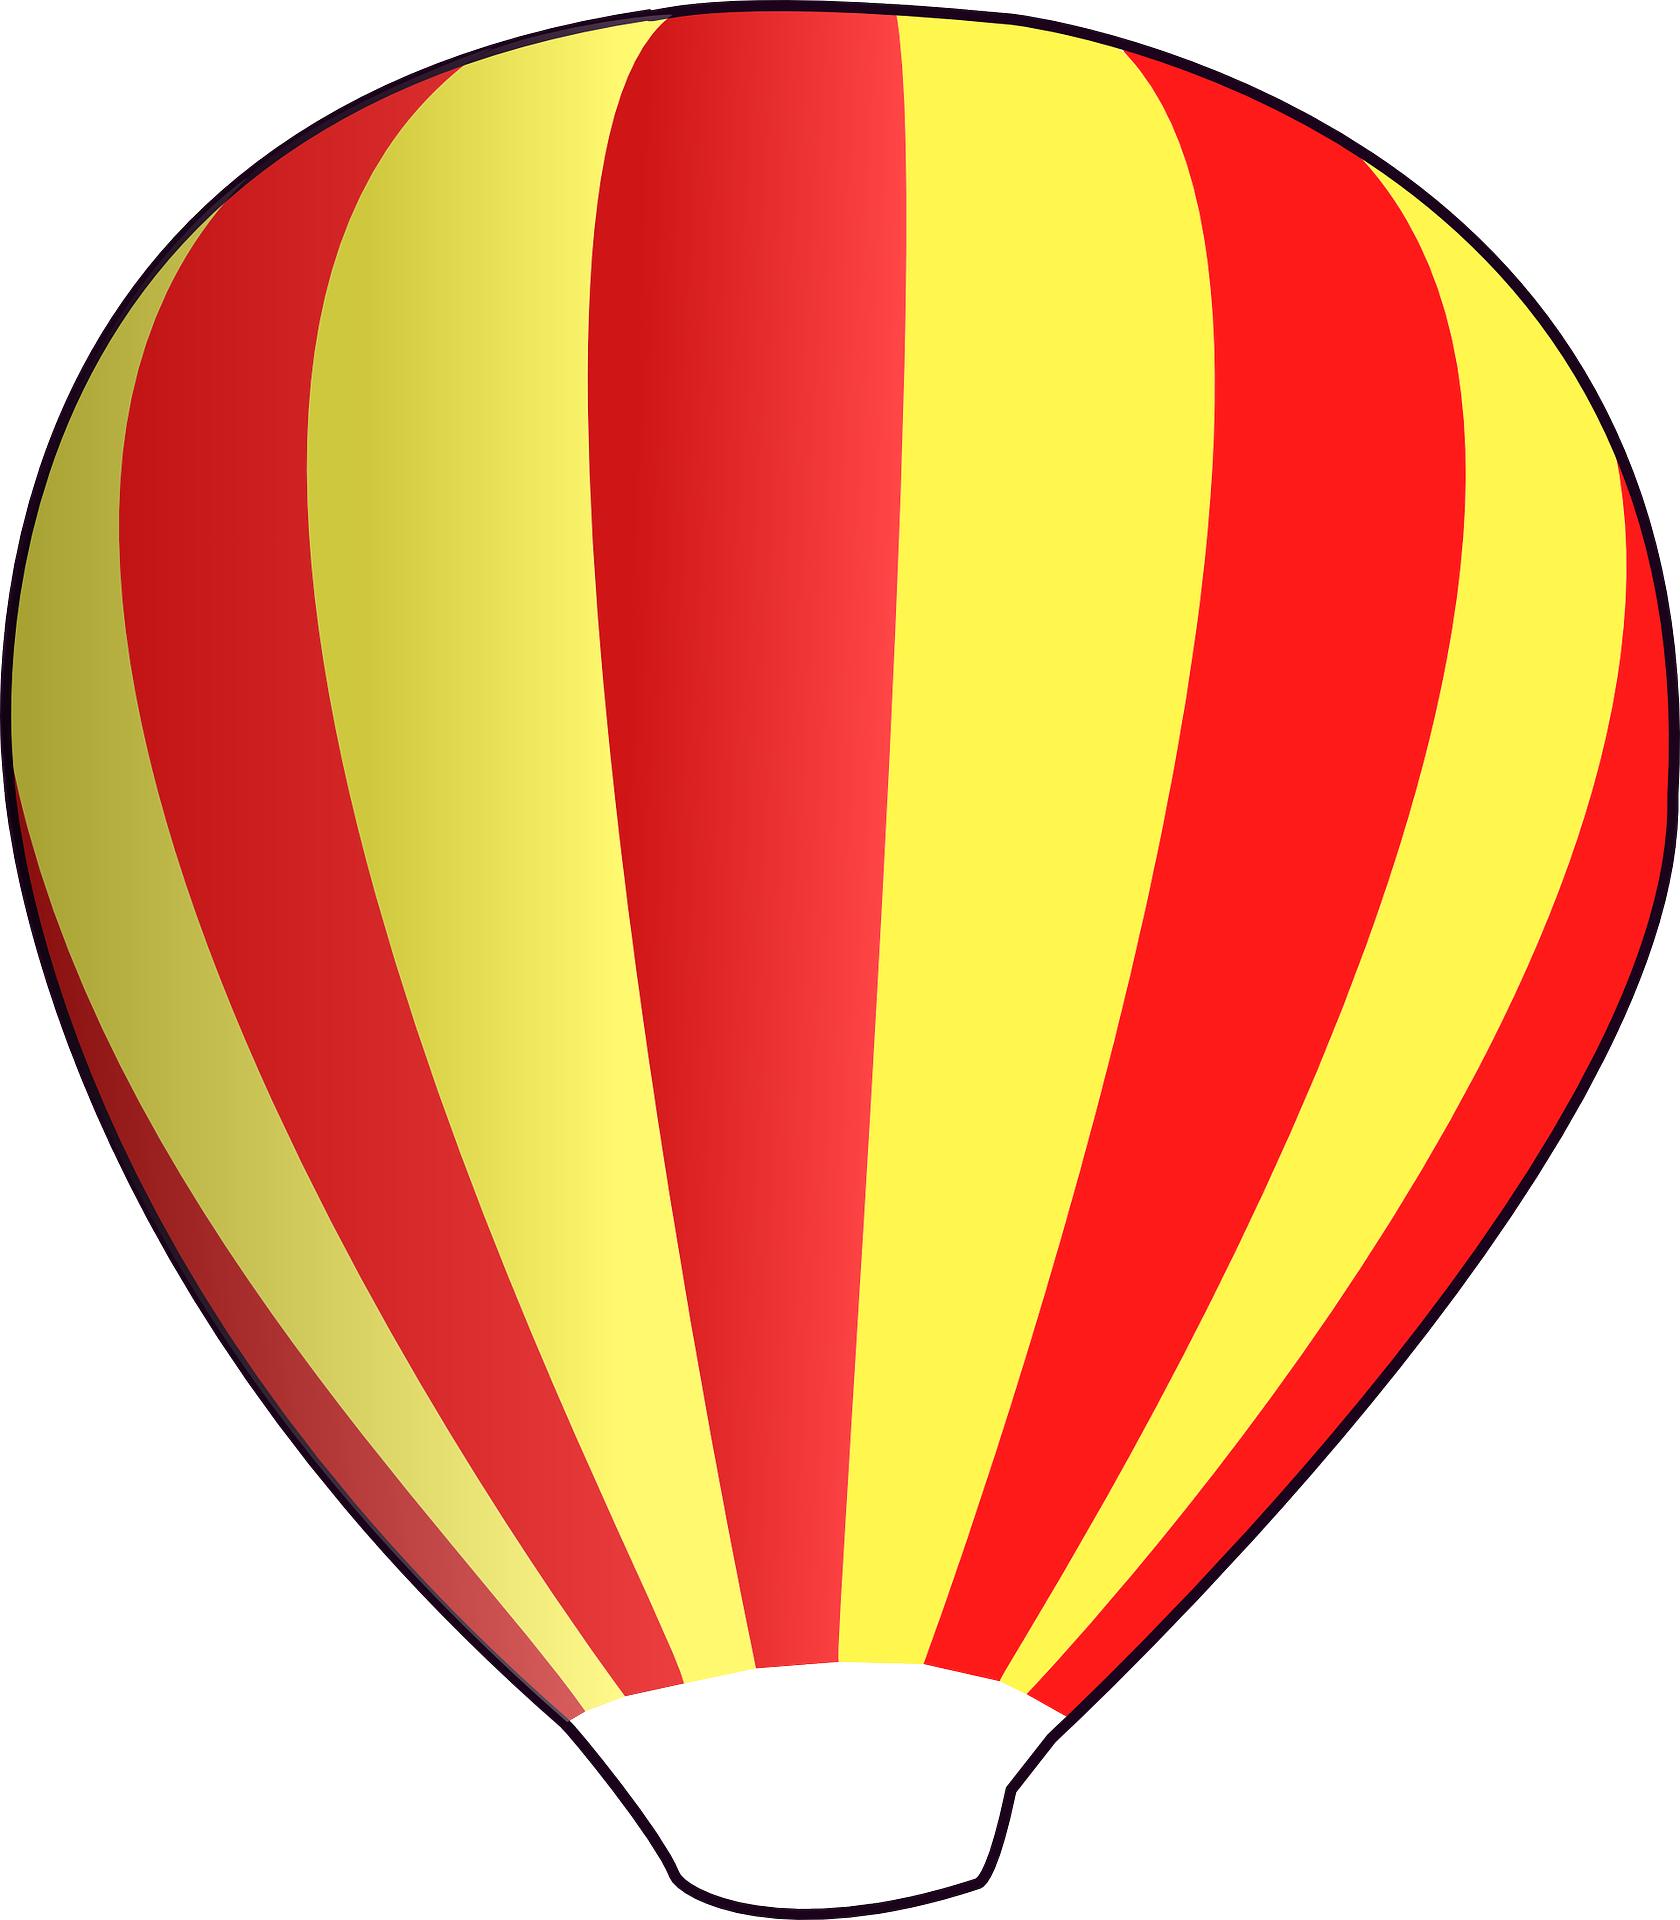 Red hot air balloon vector